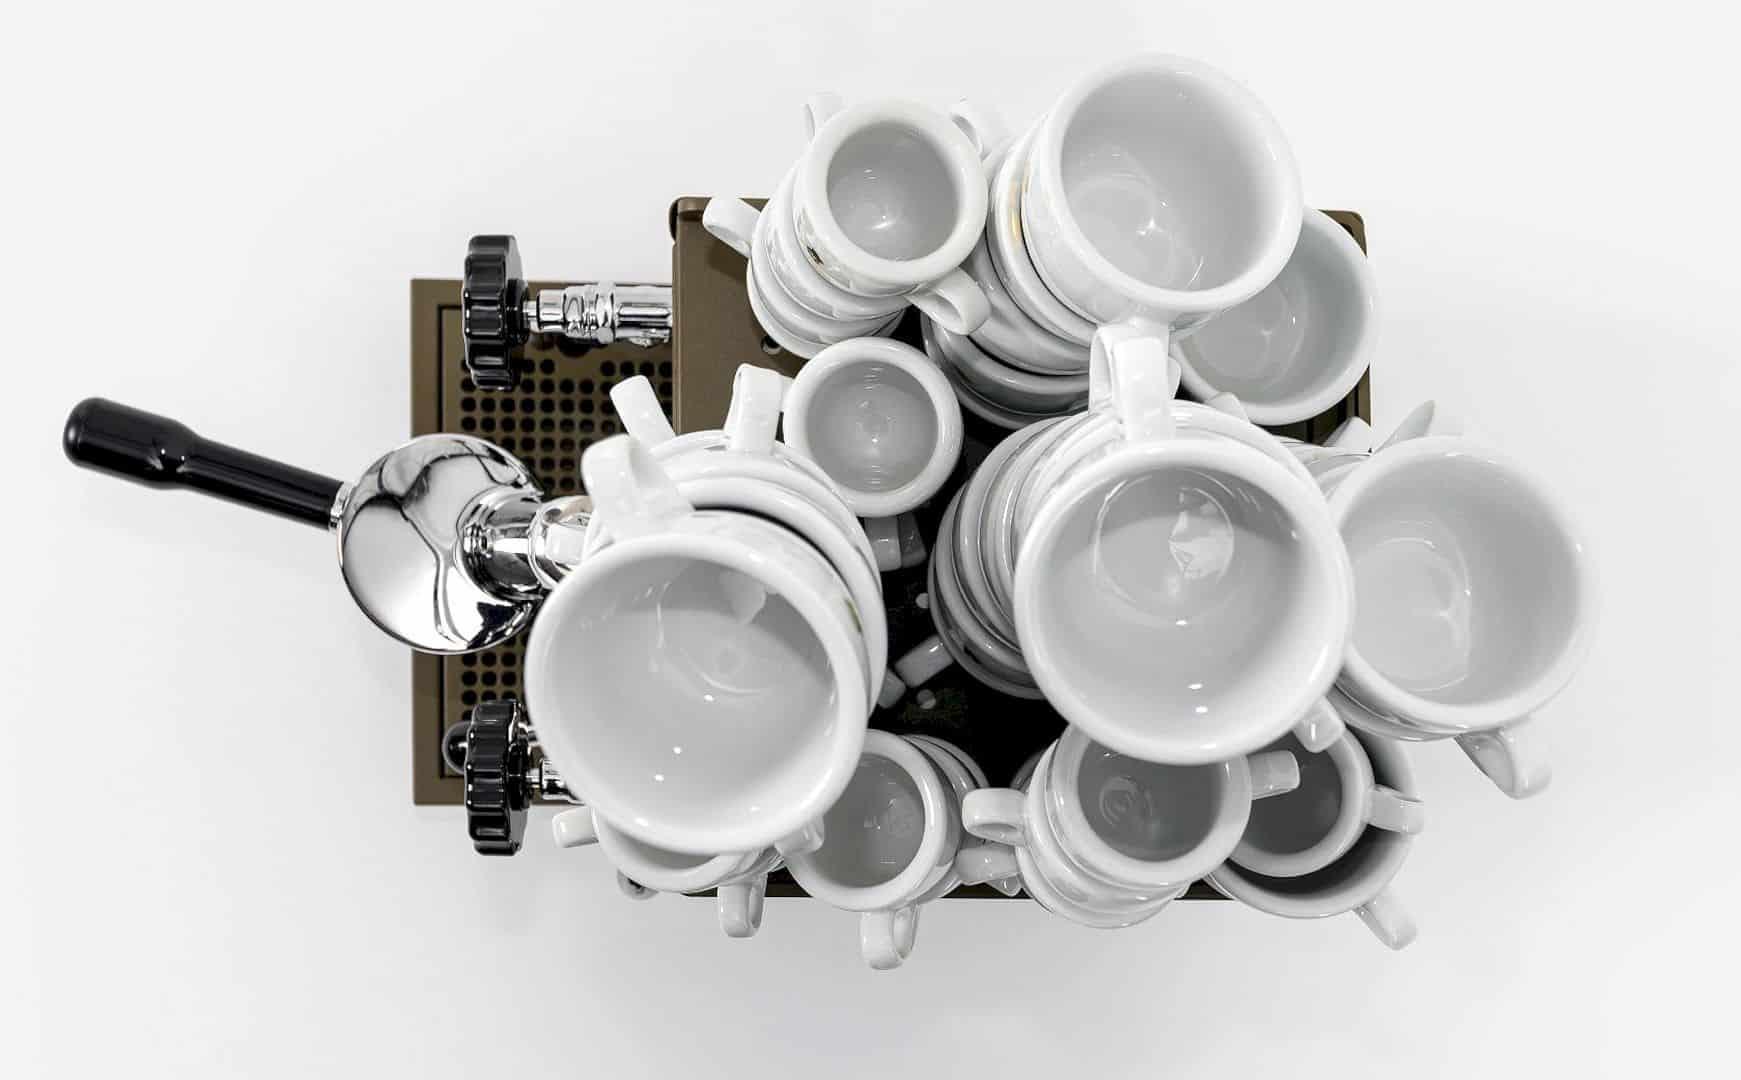 Carhartt WIP X Rocket Espresso Milano 2